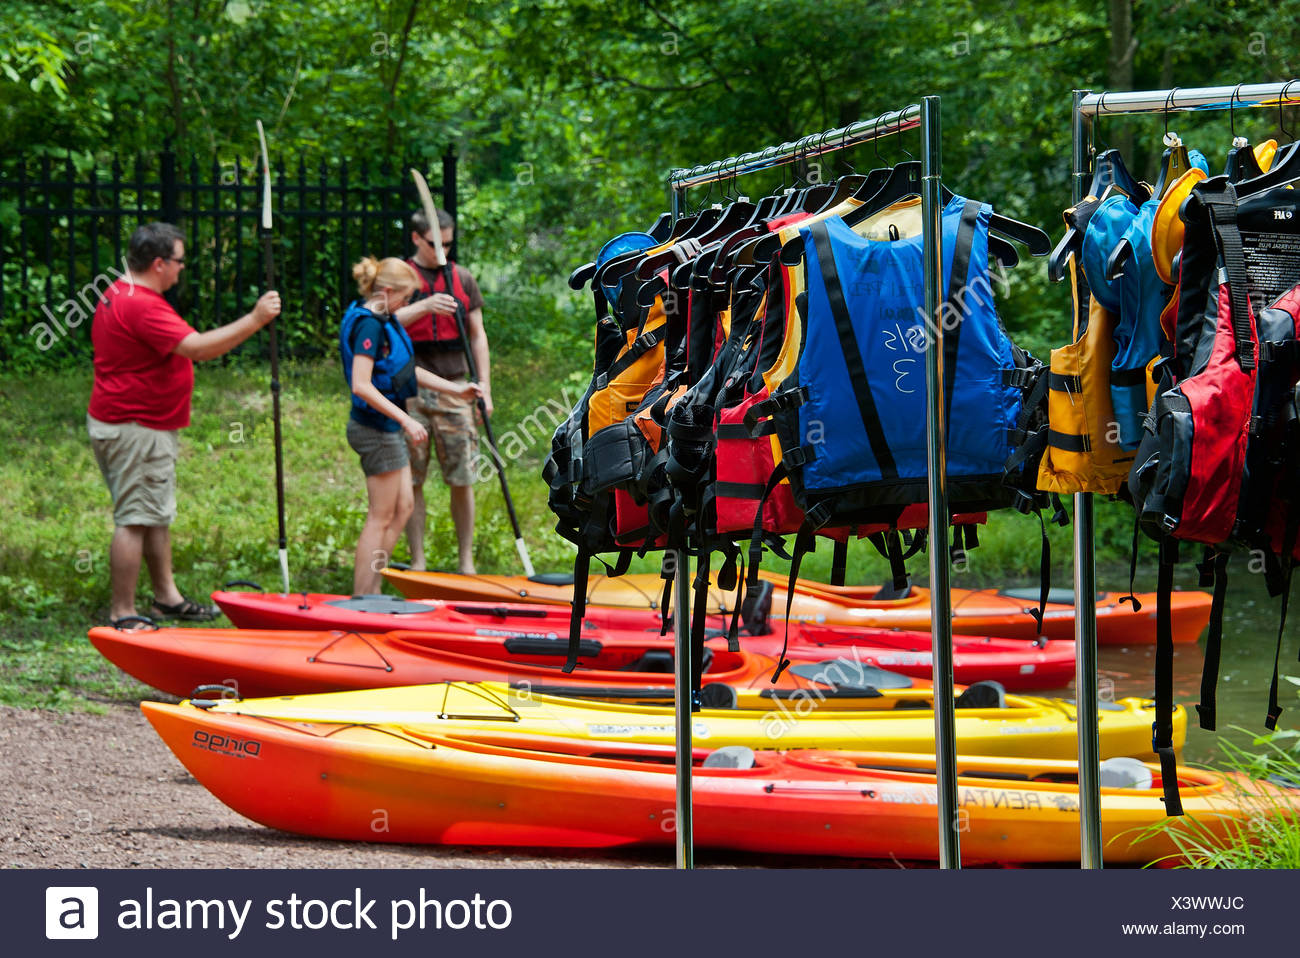 Noleggio kayak istruzione, smithville, new jersey Immagini Stock